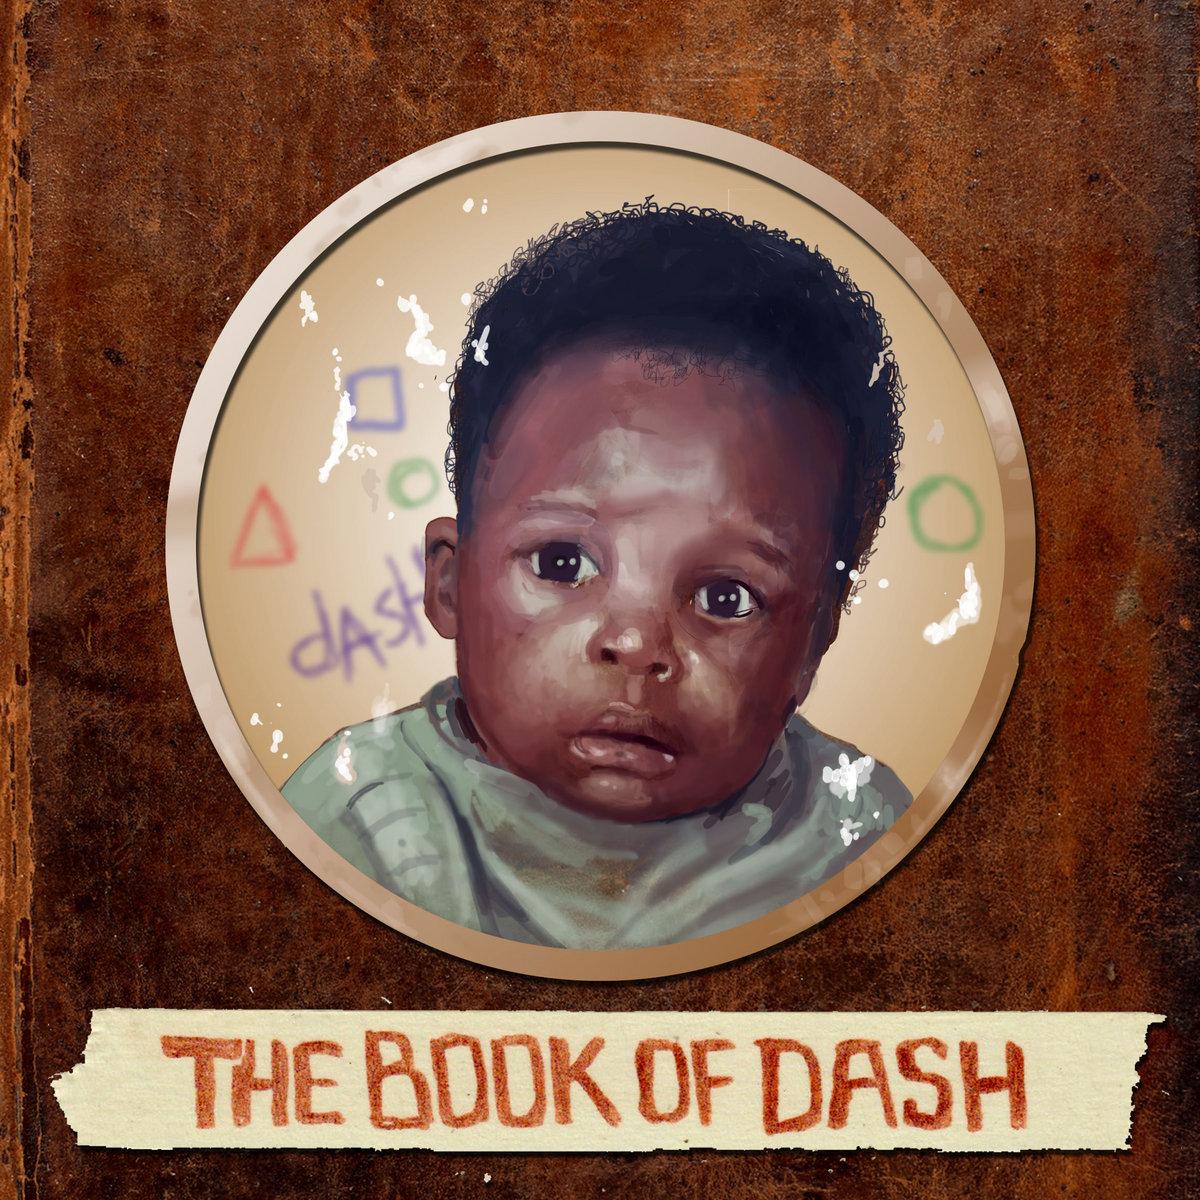 Dash the baptist by dash the baptist malvernweather Gallery